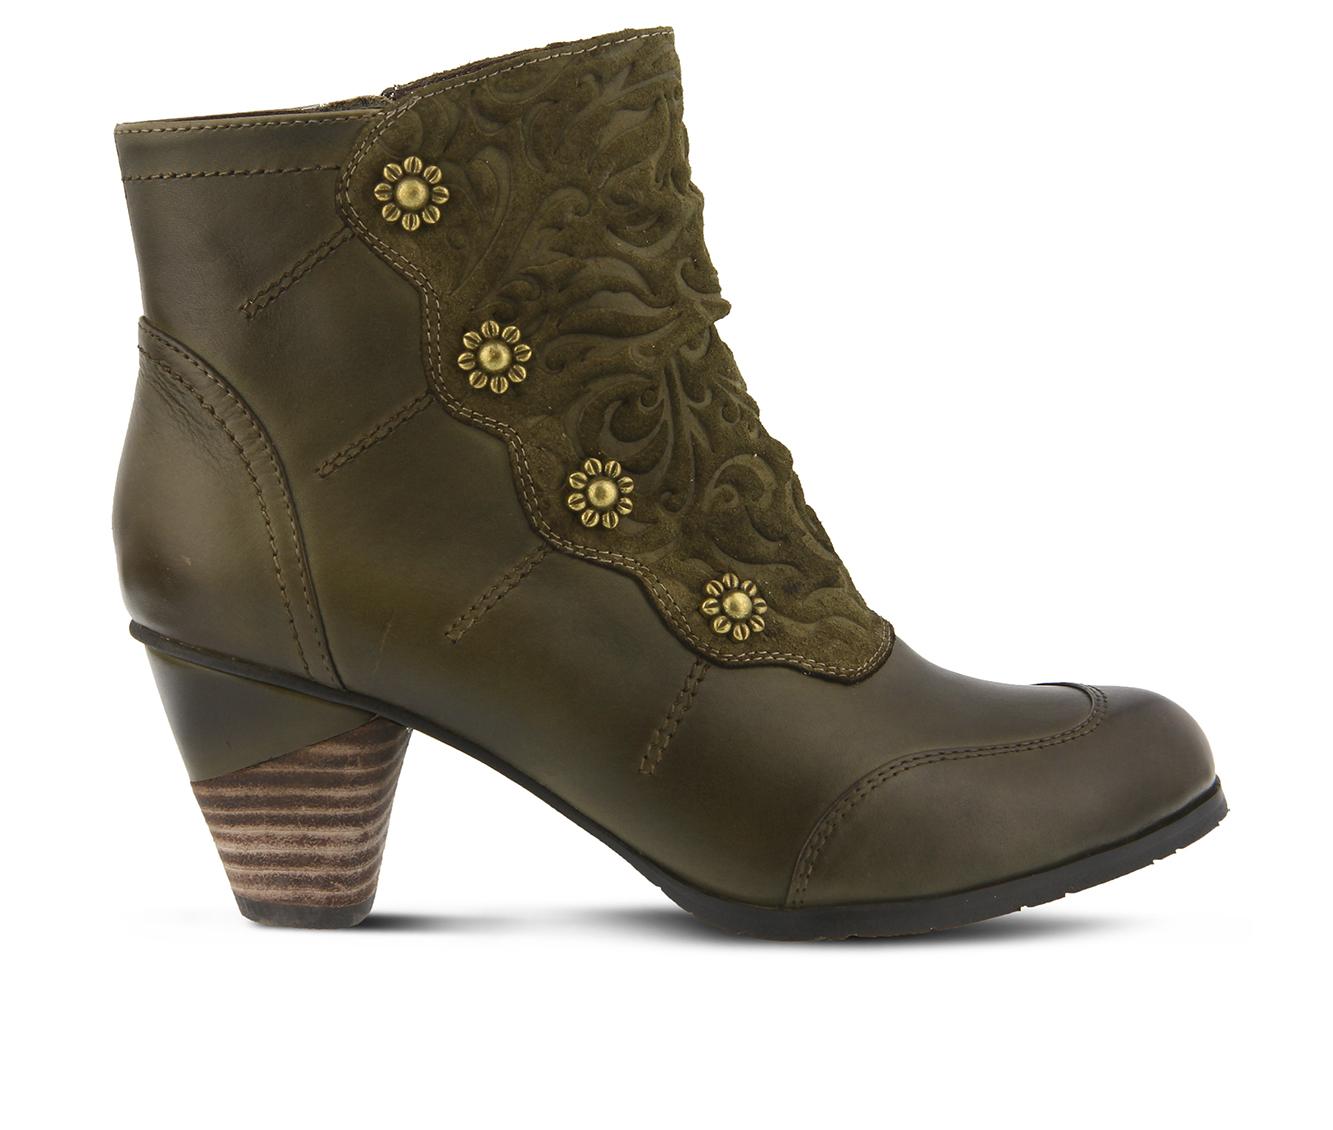 L'Artiste Belgard Women's Boots (Green Leather)